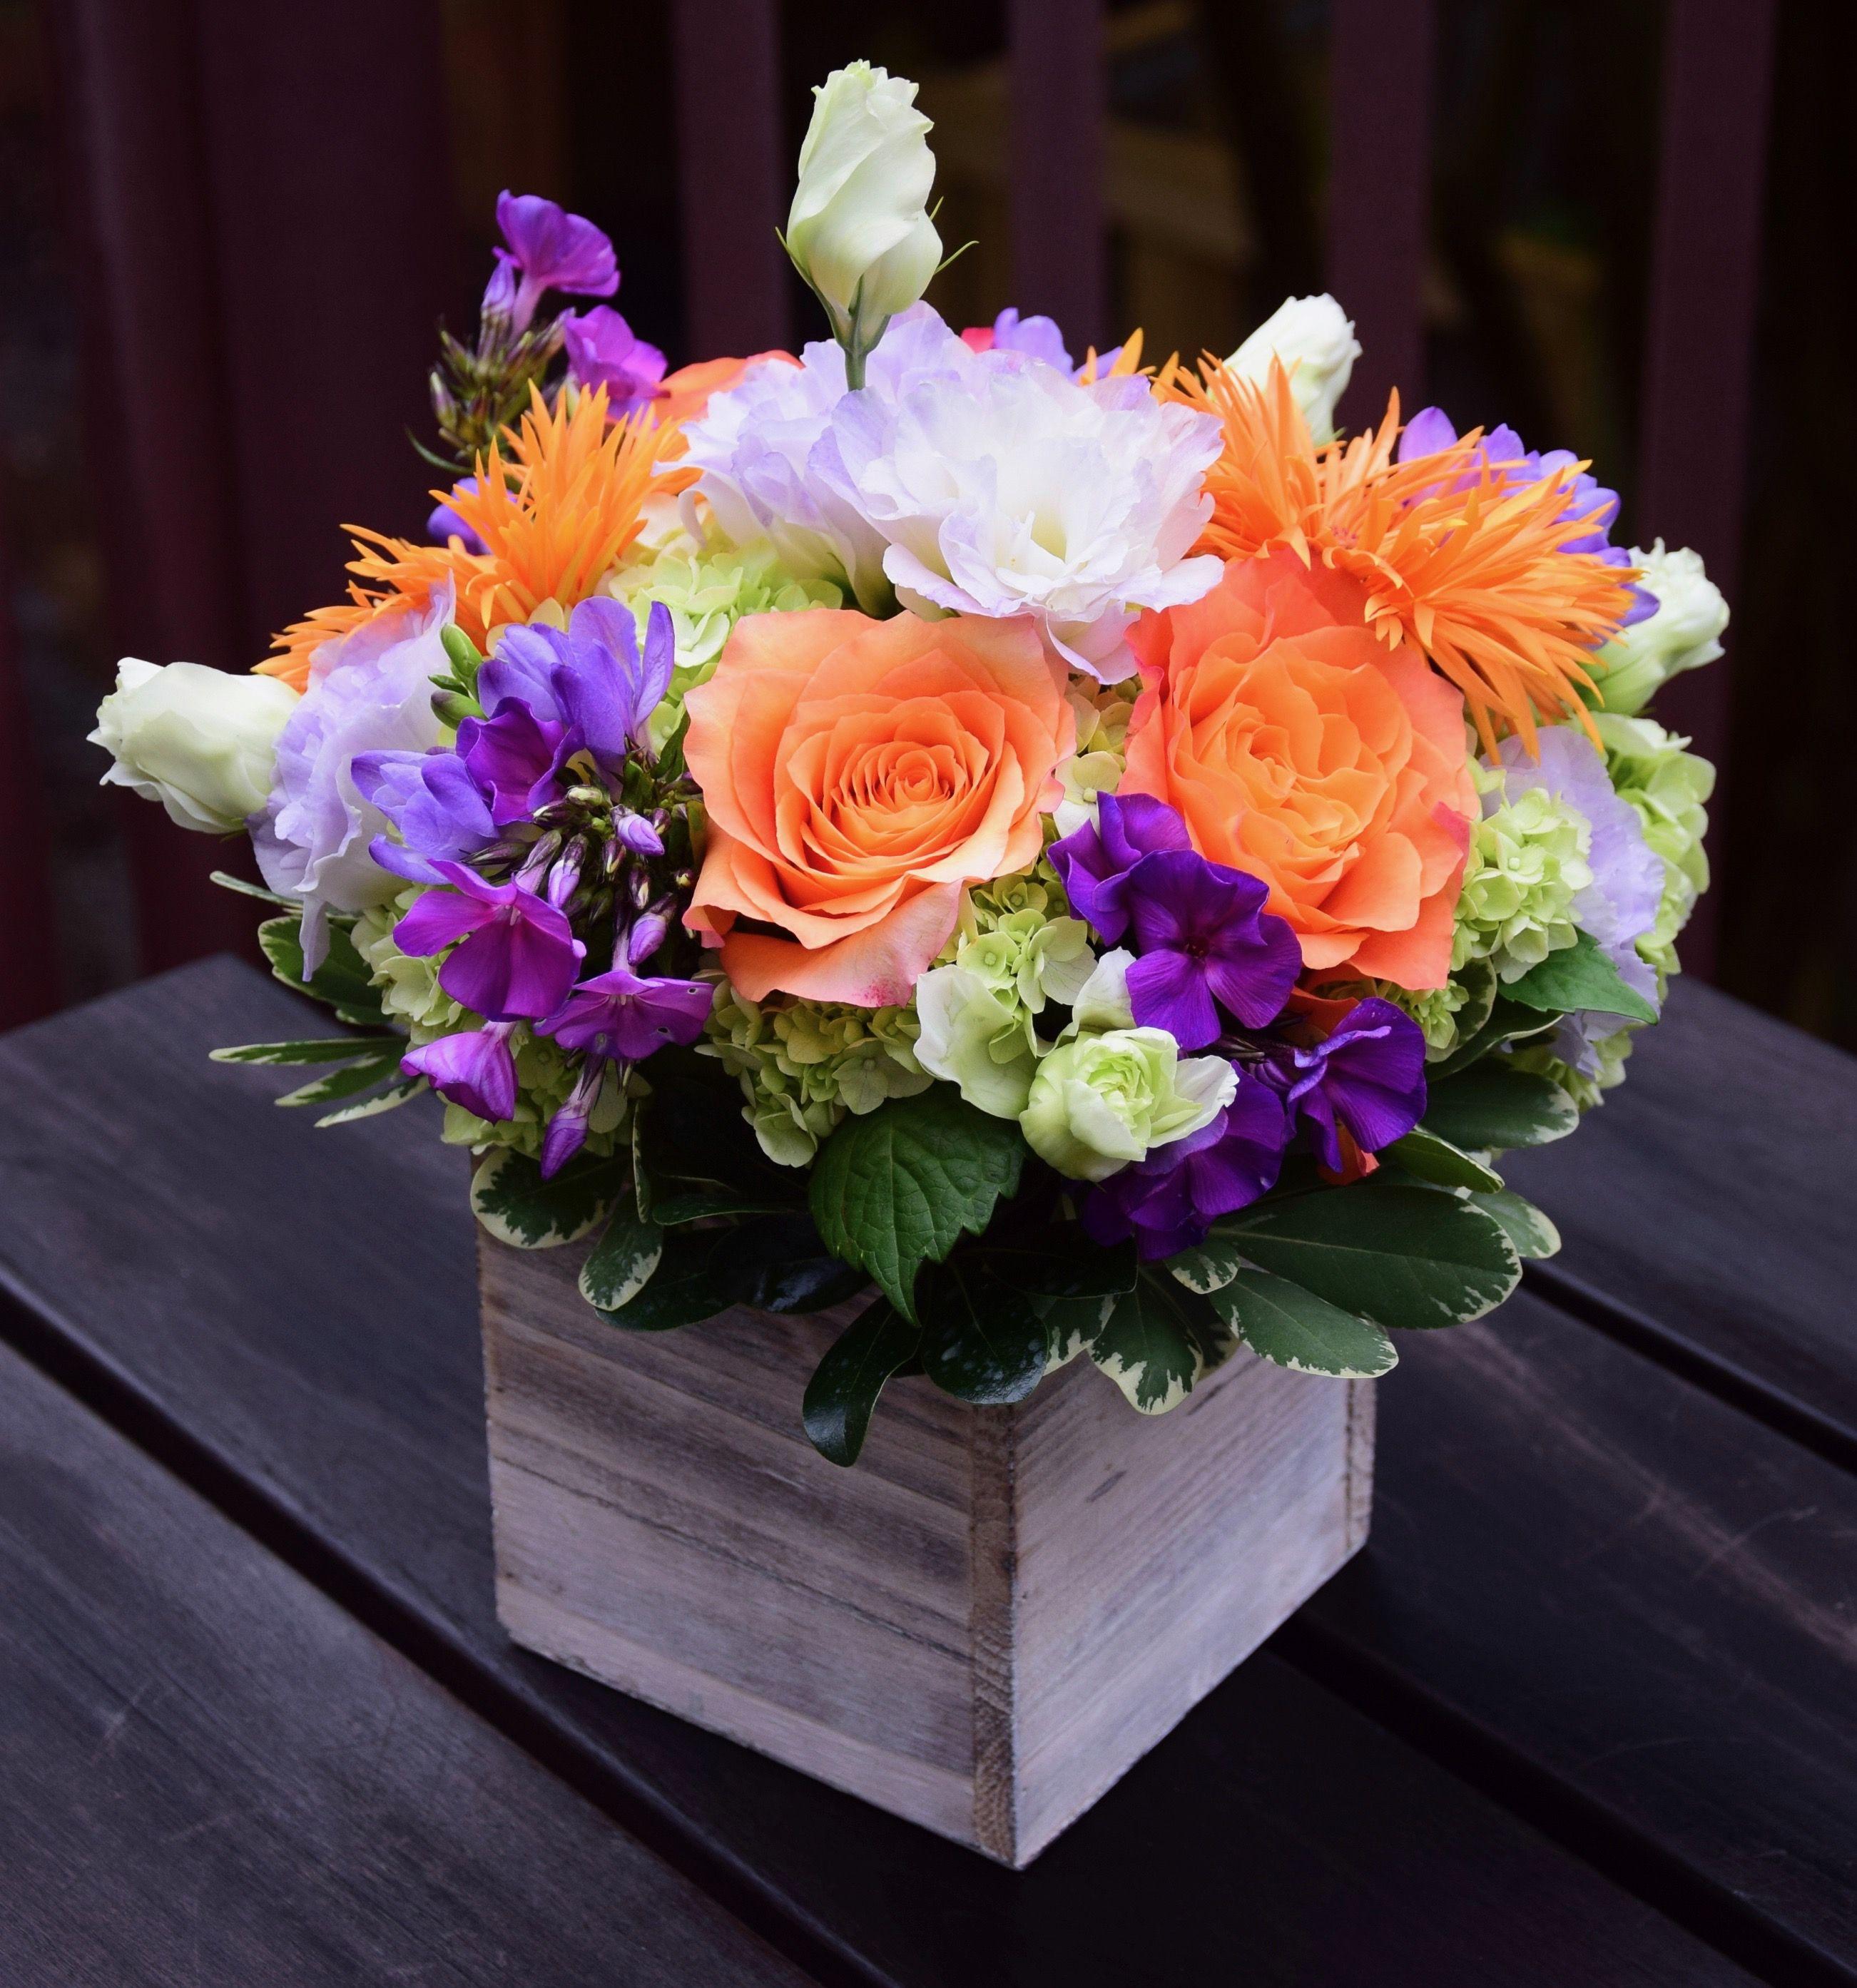 Flower Gift Box Handcrafted By Fleurelity Flower Arrangements Simple Flower Arrangements Diy Artificial Fresh Flowers Arrangements